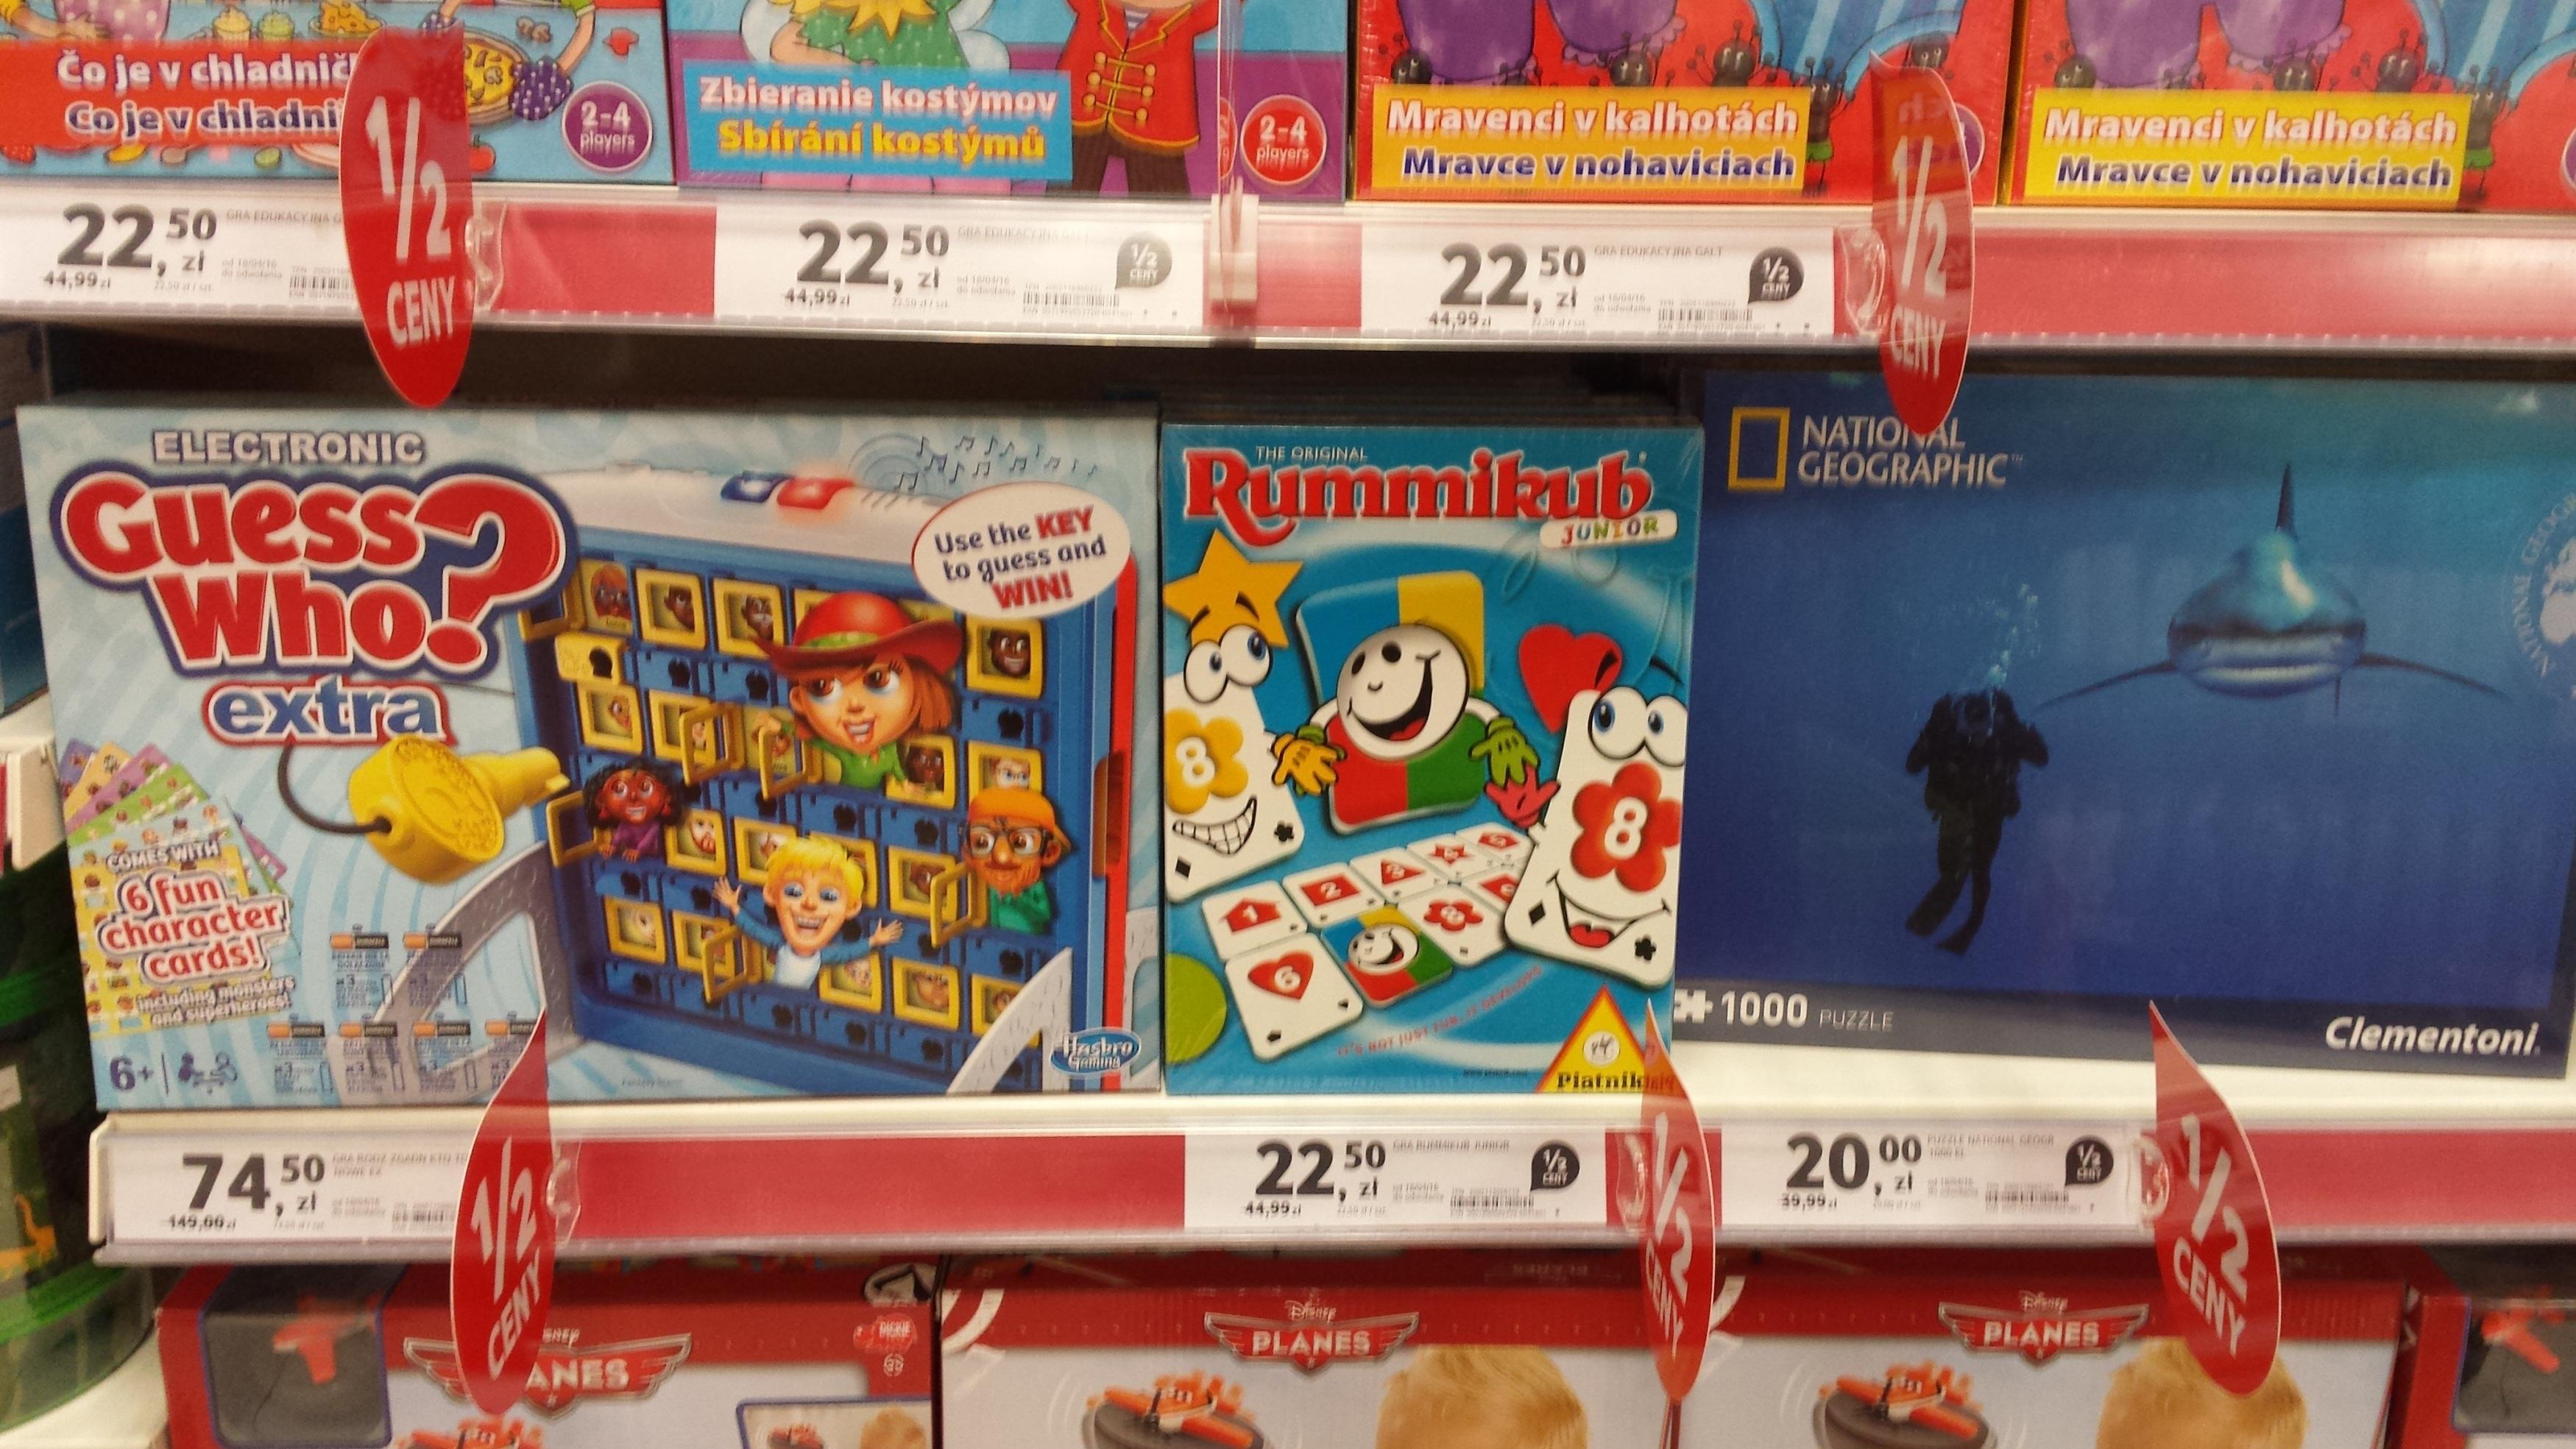 zabawki i animacje dvd @ Tesco lokalnie